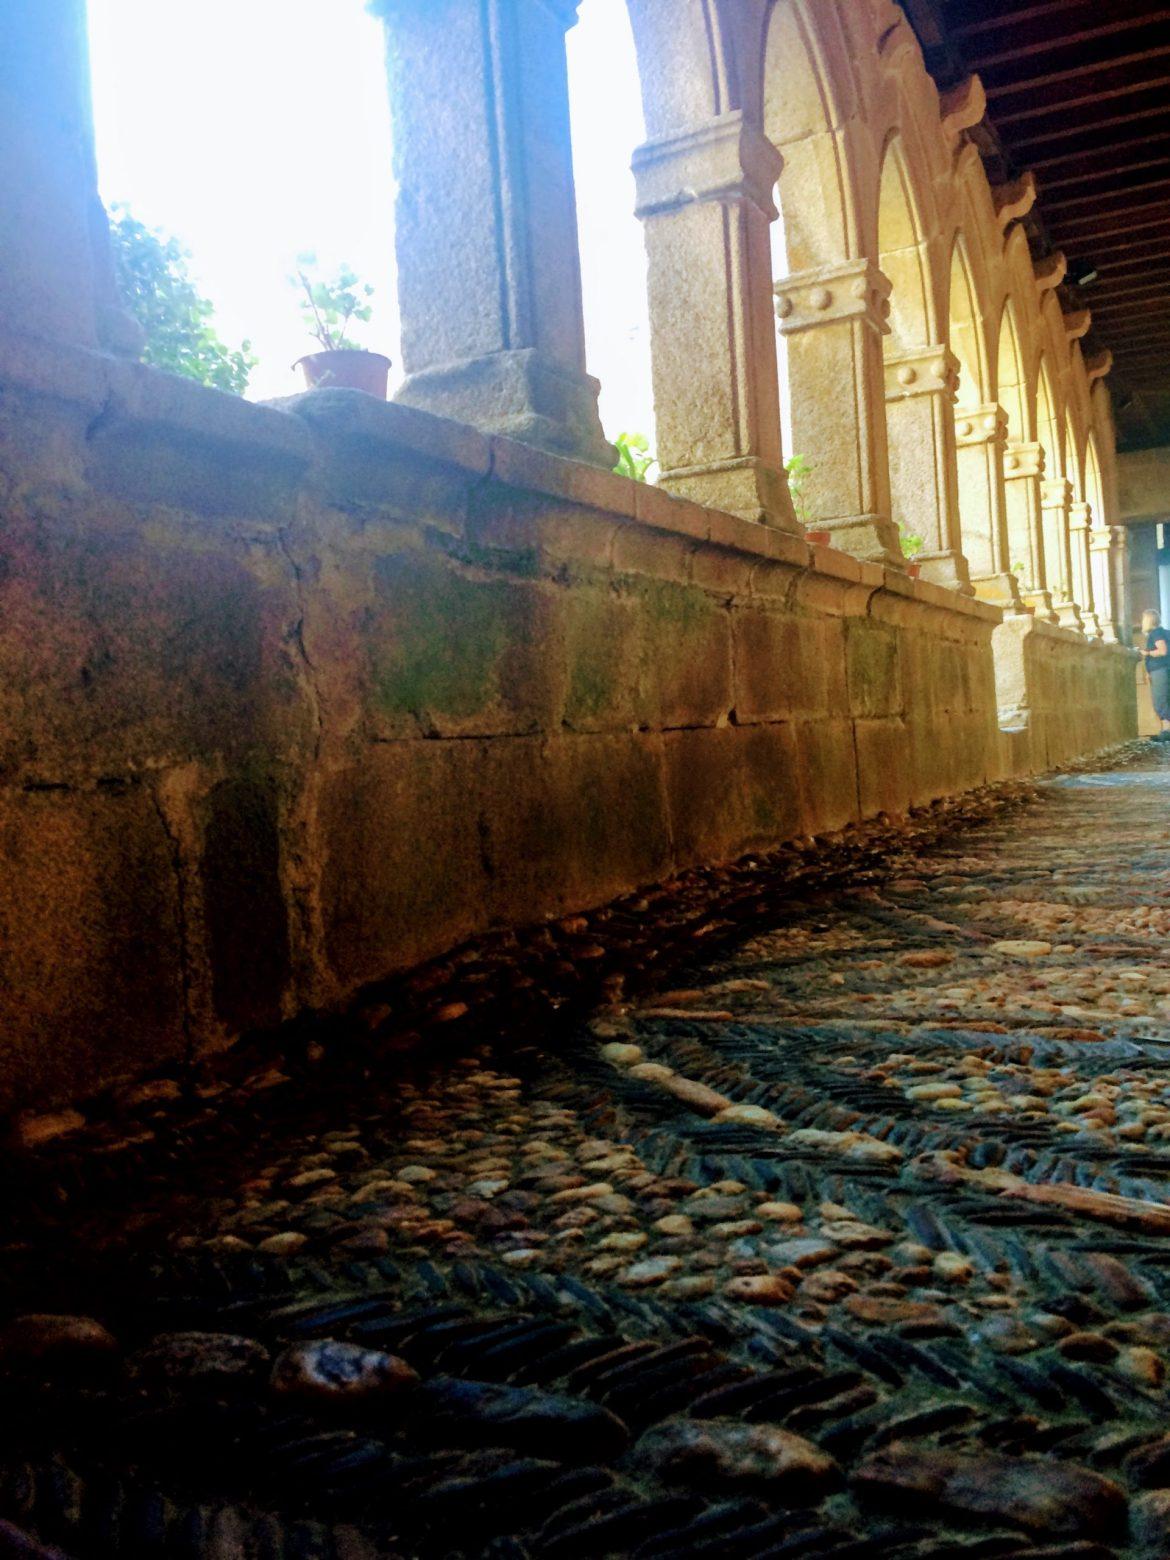 Camino Love, Camino de Santiago, cathedral courtyard in sarria